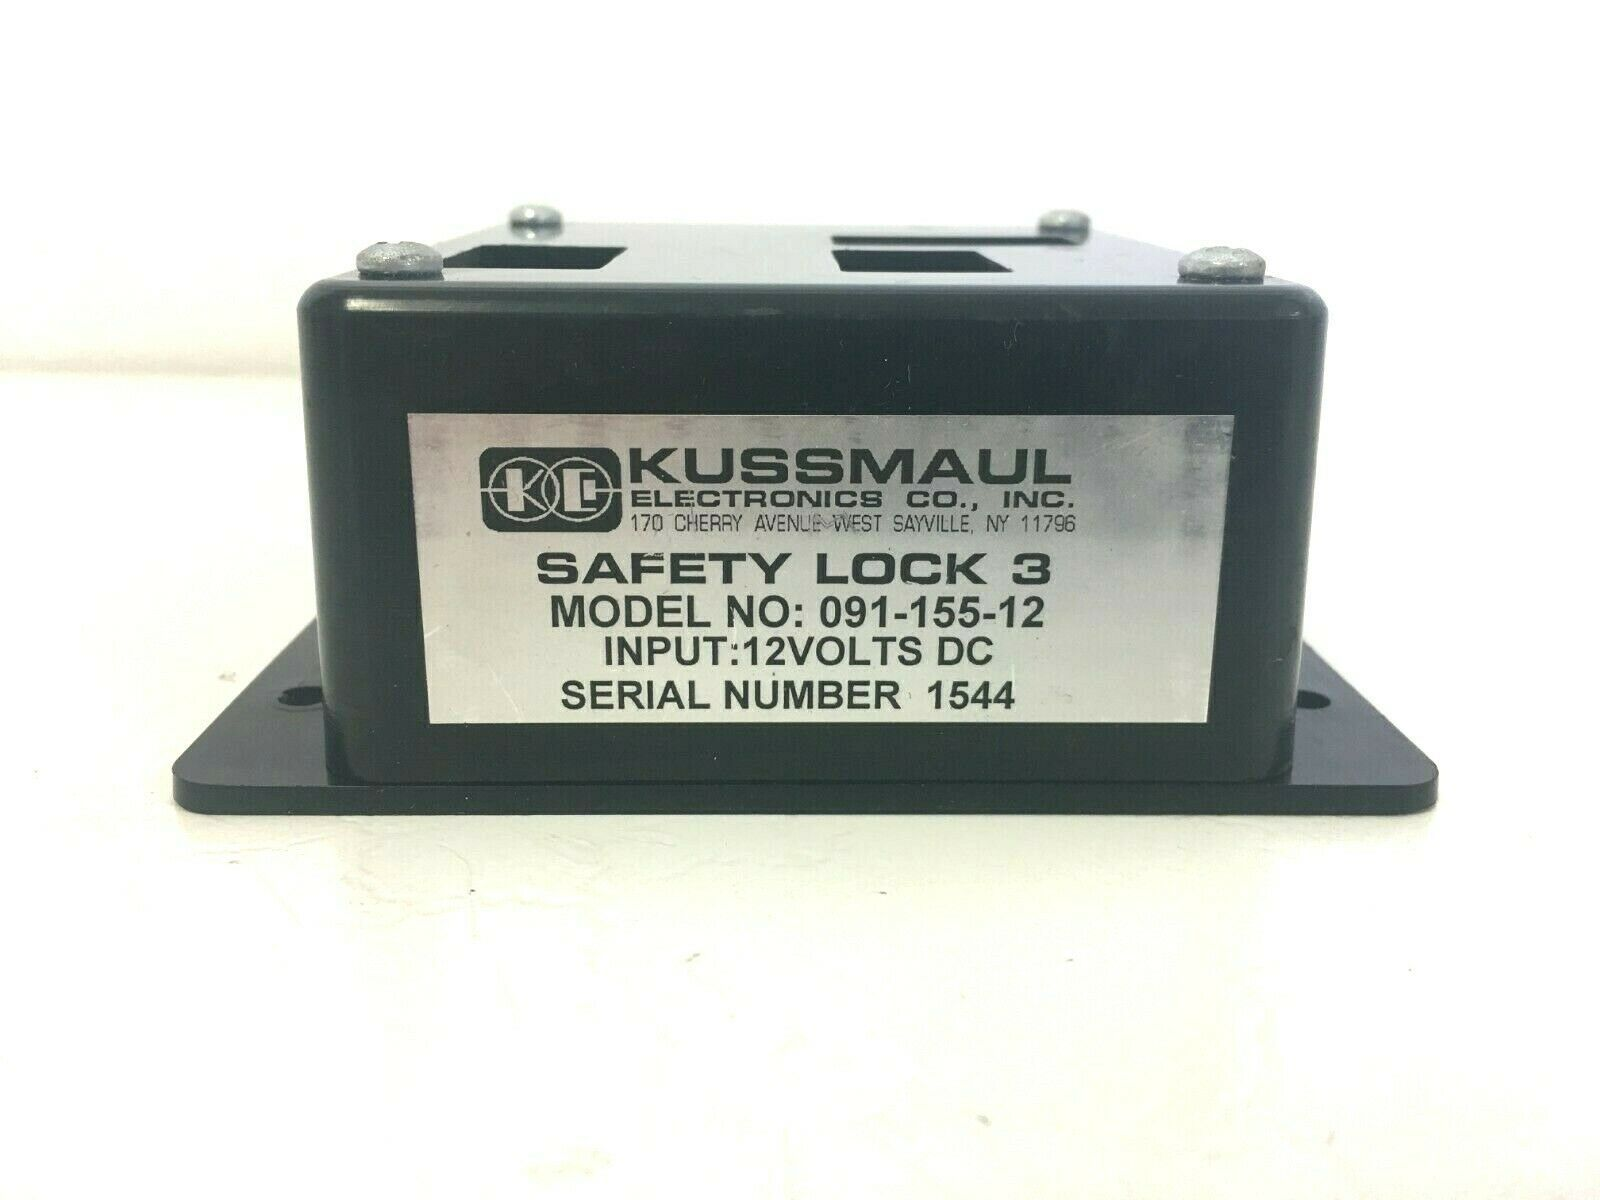 Kussmaul Safety lock 3 model 091-155-12 (8446)